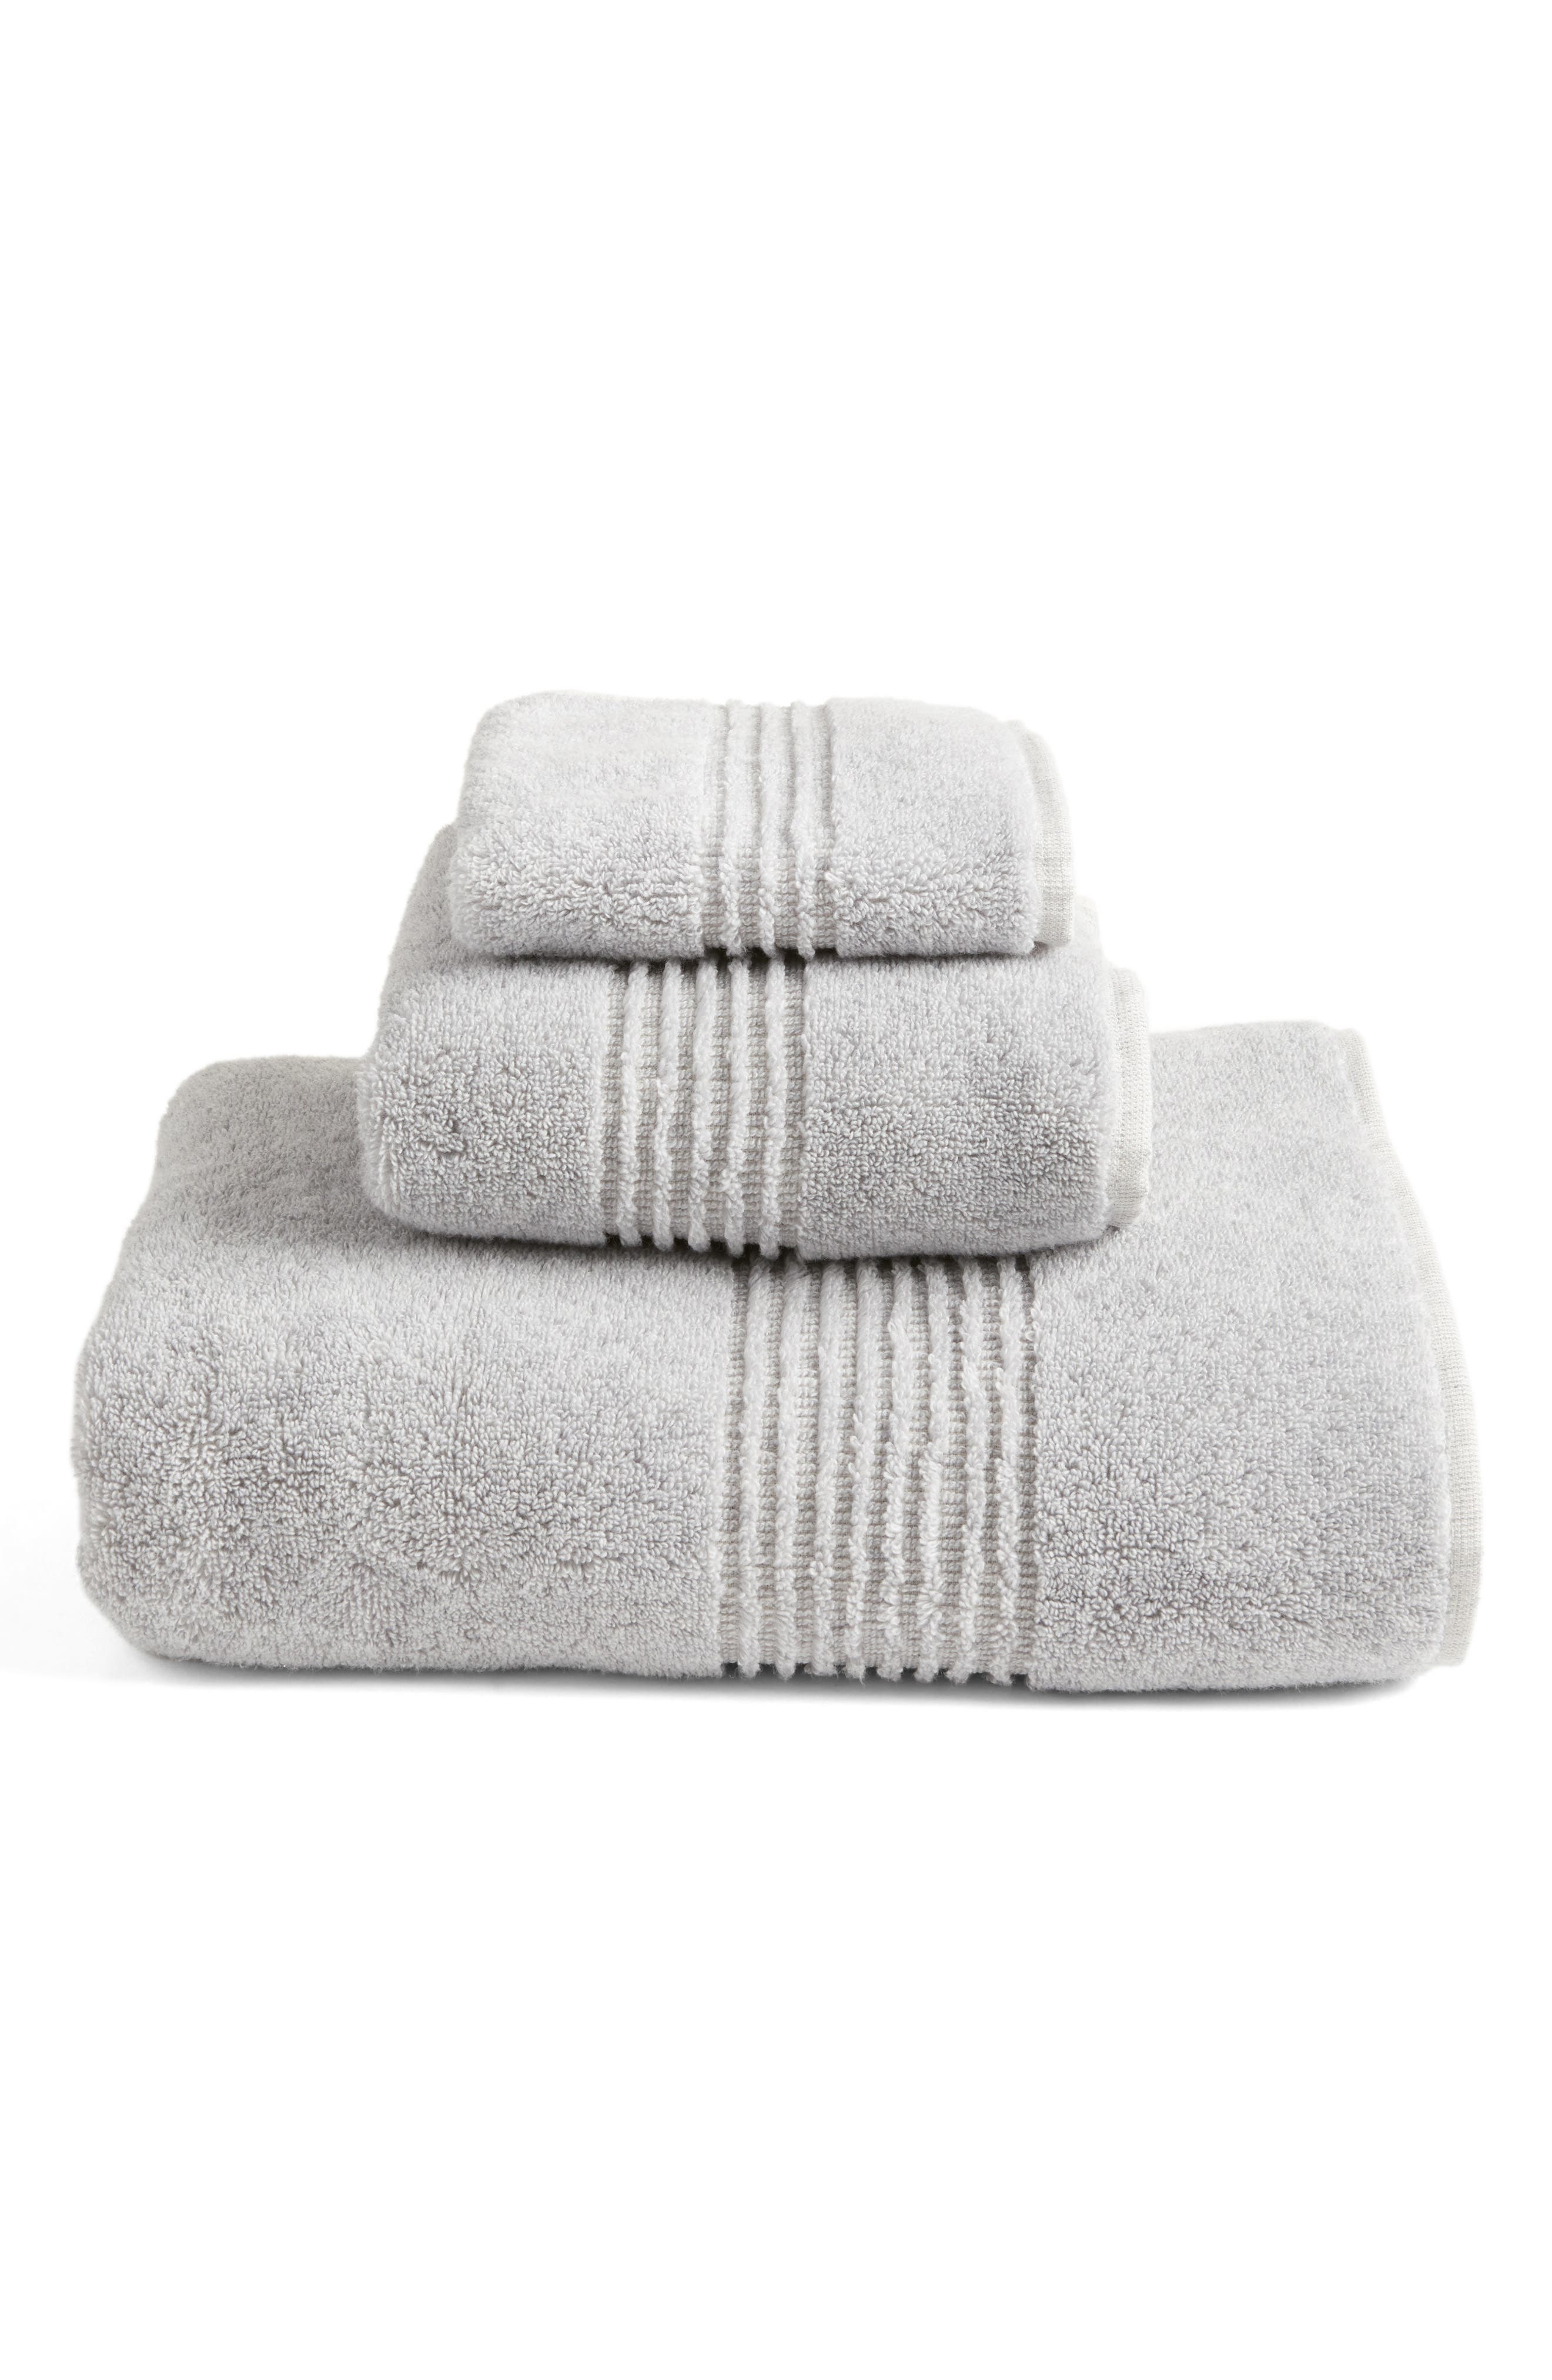 Organic Hydrocotton Washcloth,                             Alternate thumbnail 2, color,                             Grey Soft